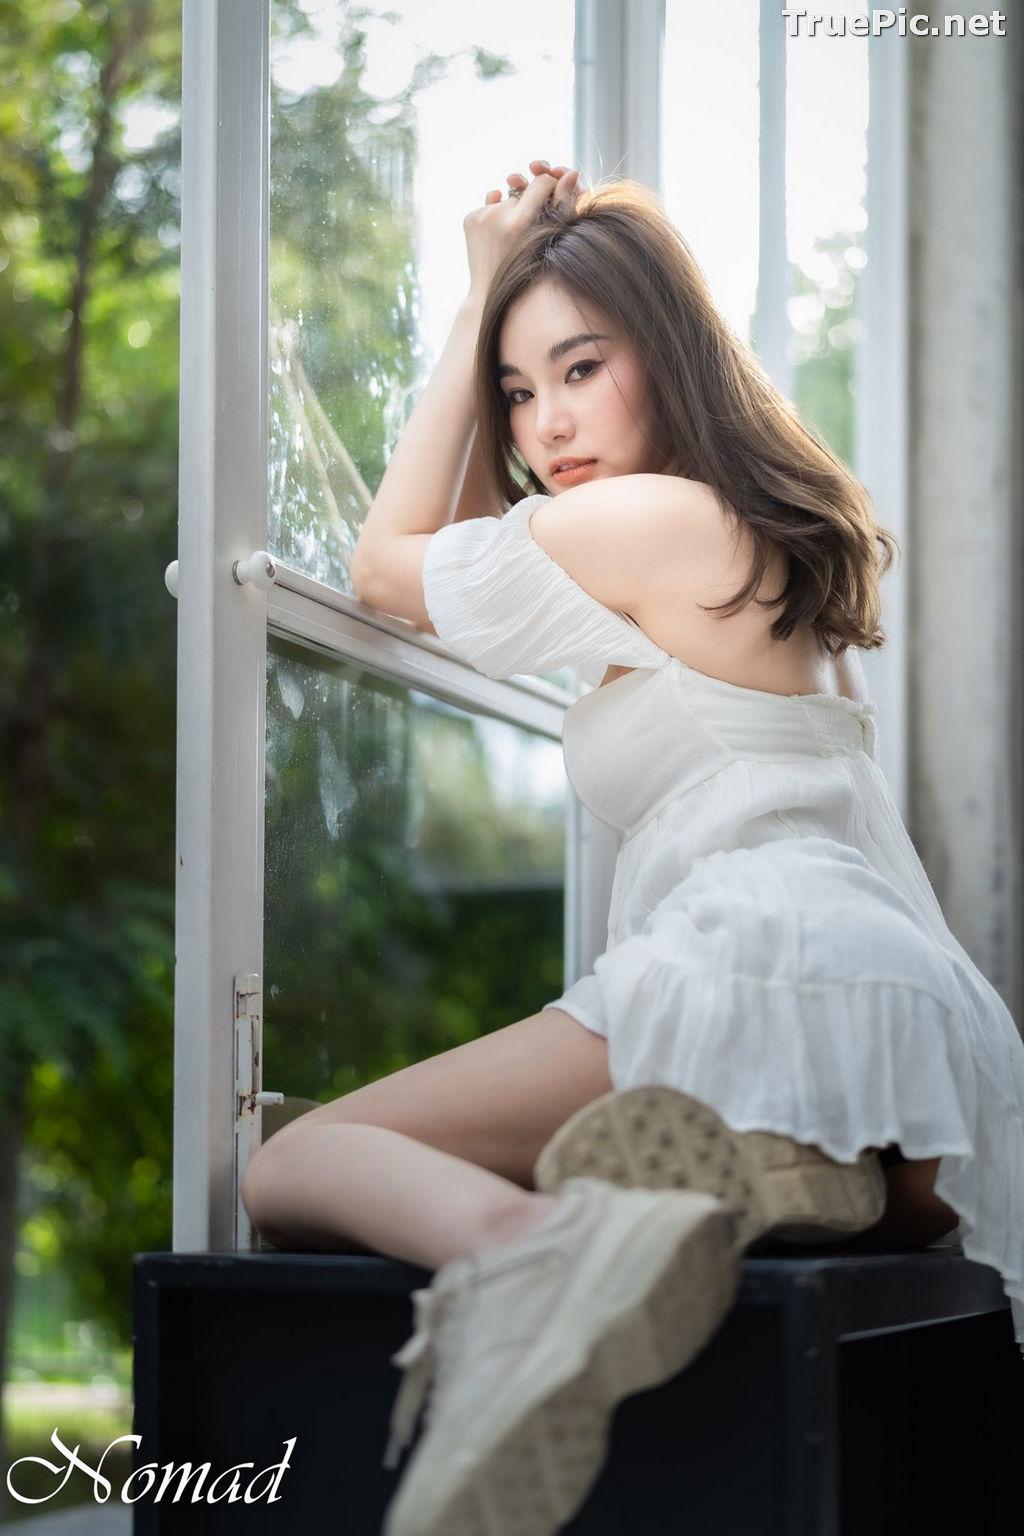 Image Thailand Model - Jarunan Tavepanya - Beautiful In Black and White - TruePic.net - Picture-5